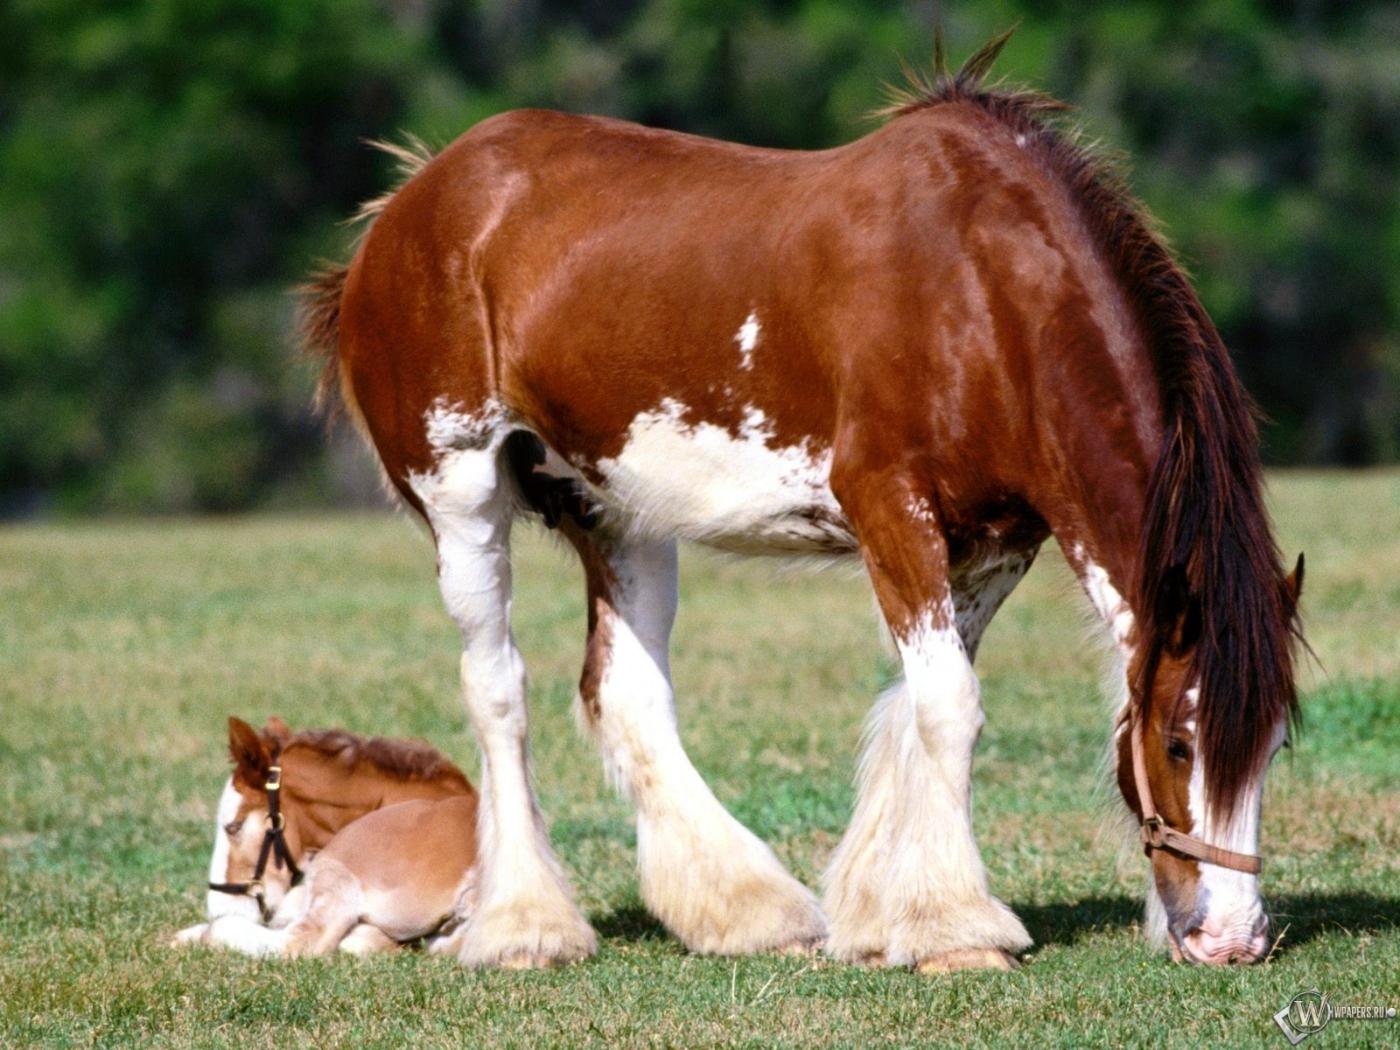 Шайр лошадь животное 1400x1050 картинки